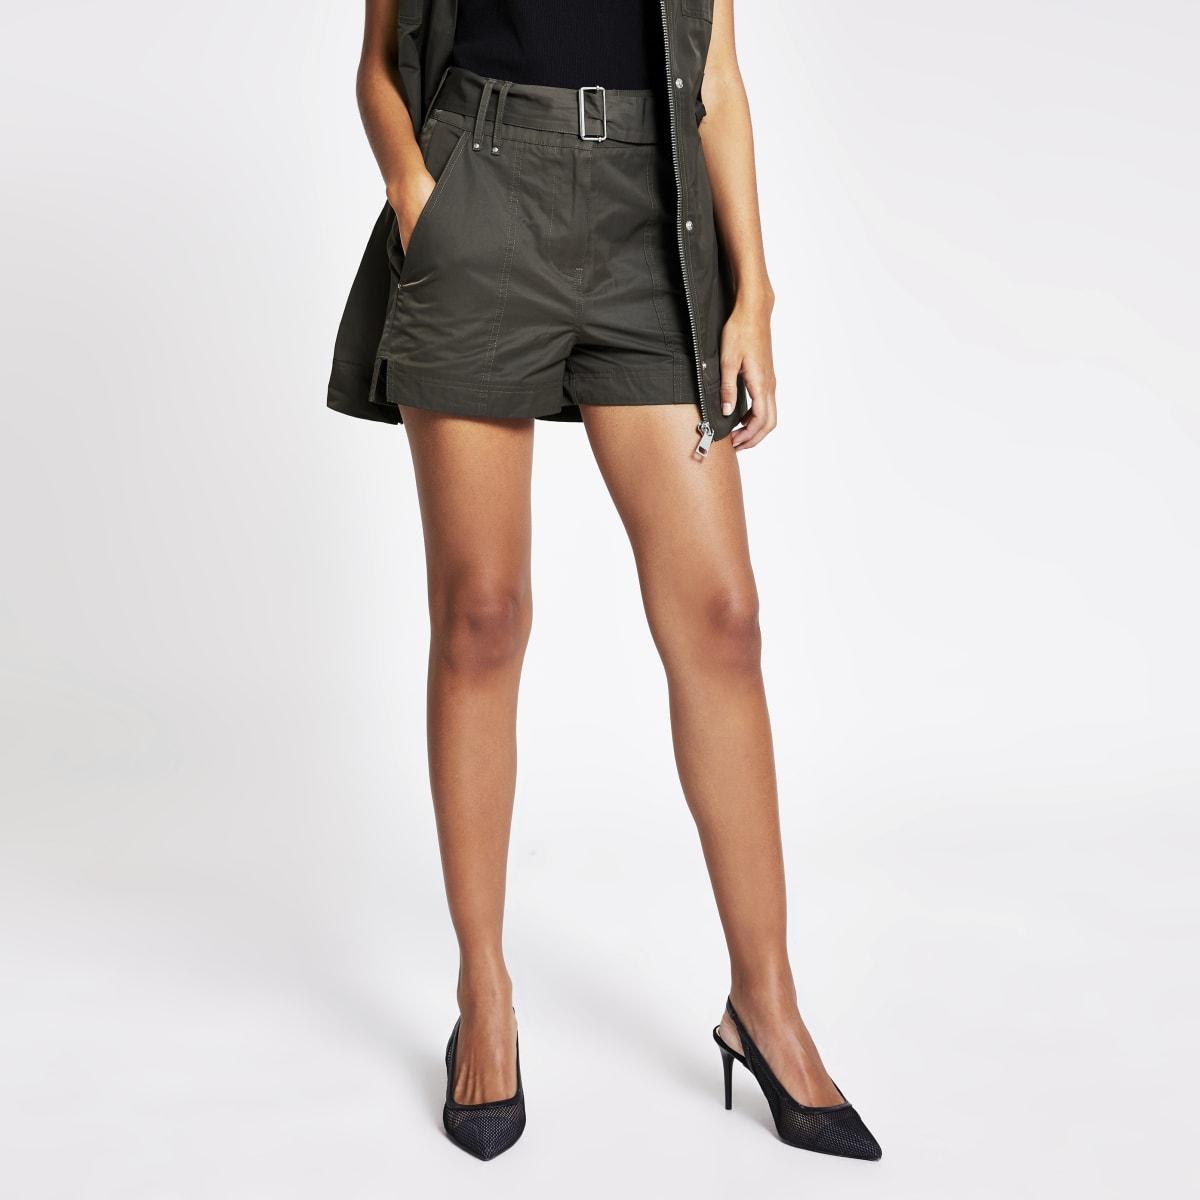 Short kaki taille haute avec ceinture